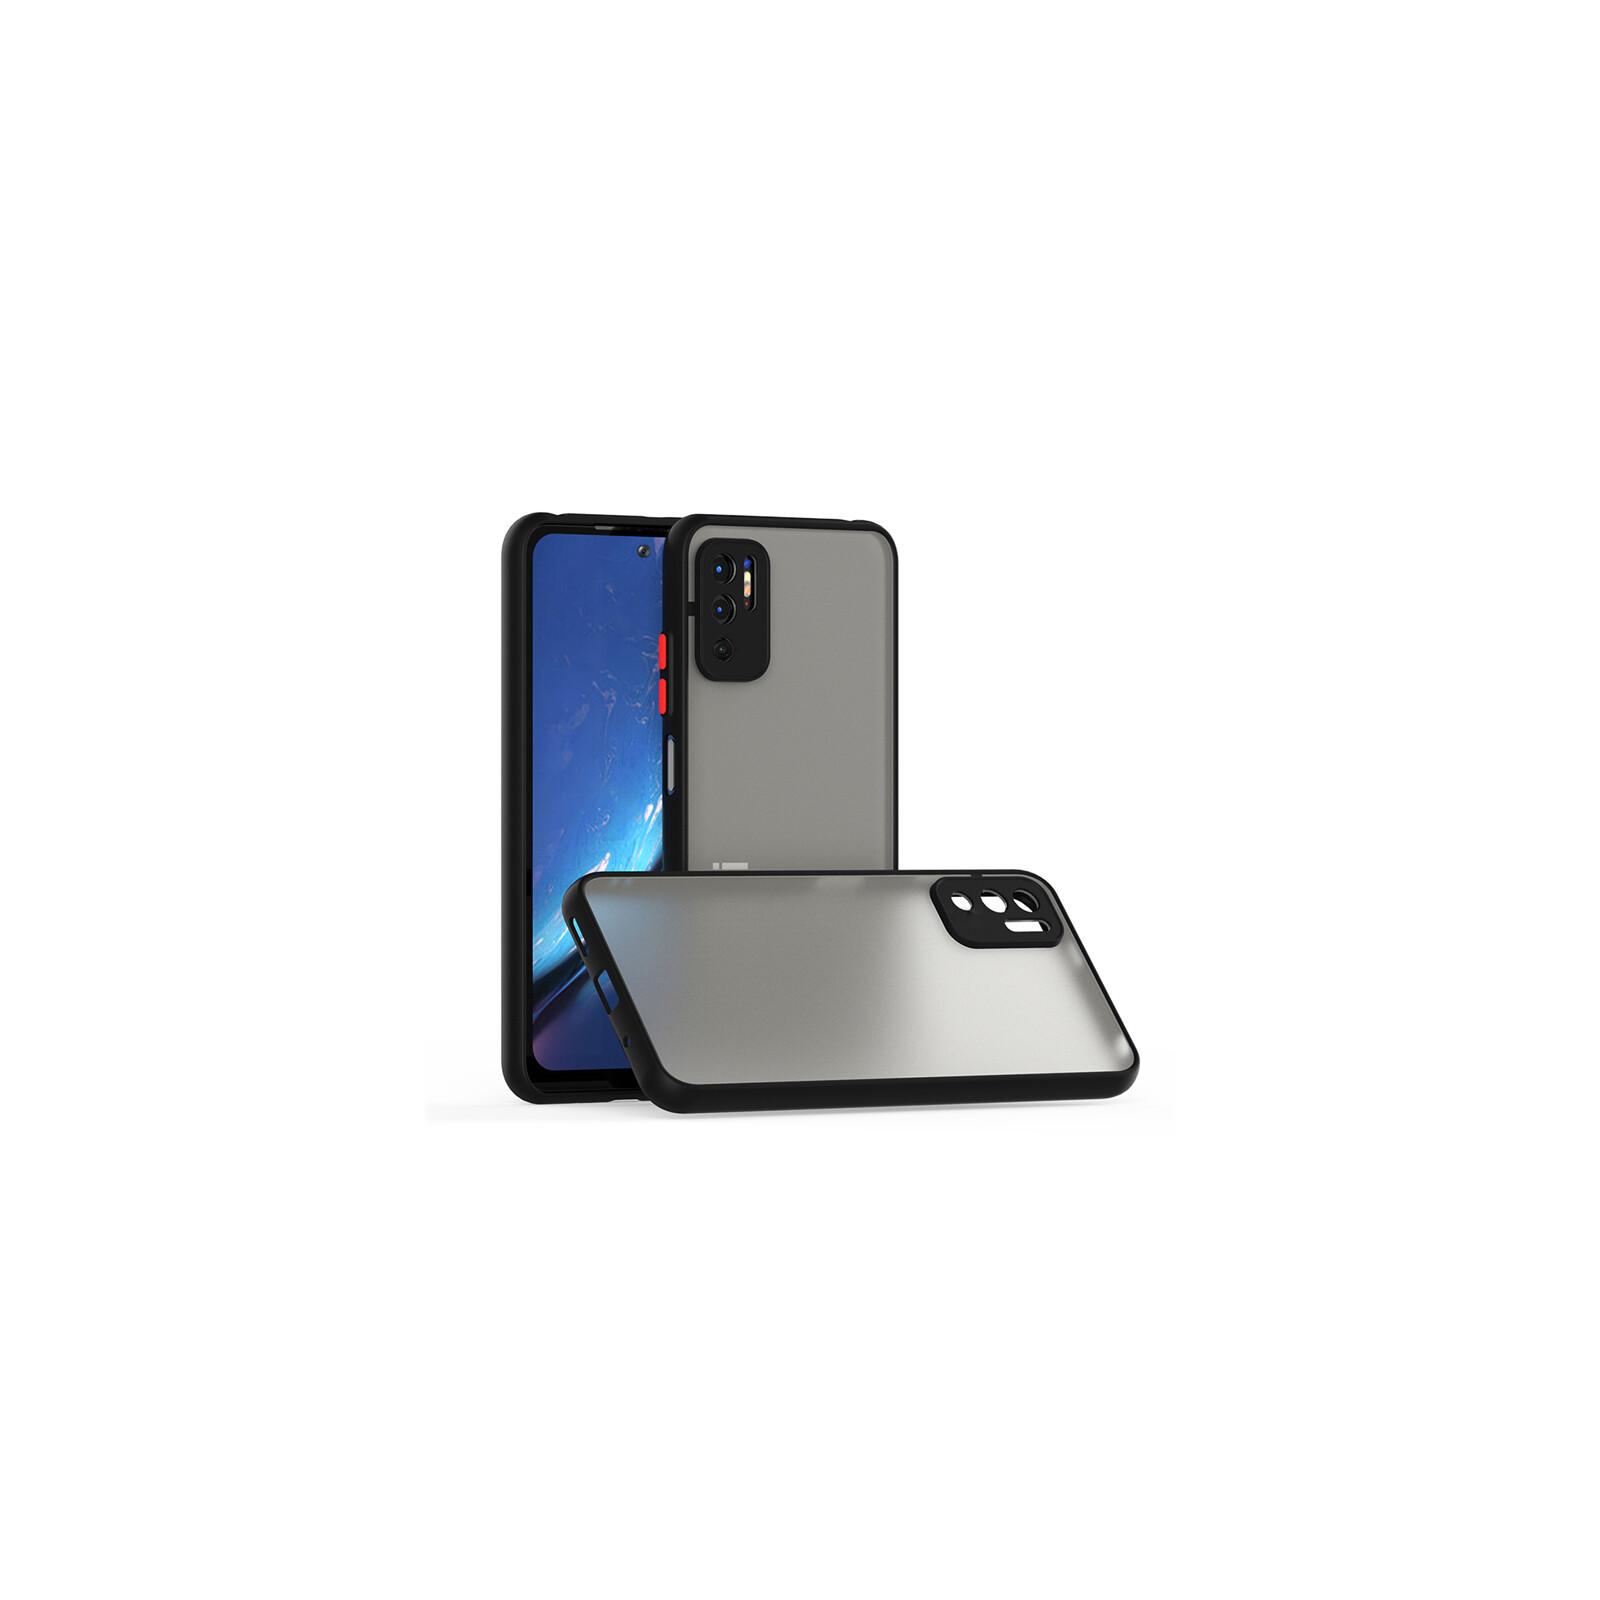 Felixx Back Xiaomi Redmi Note 10 5G clear/black